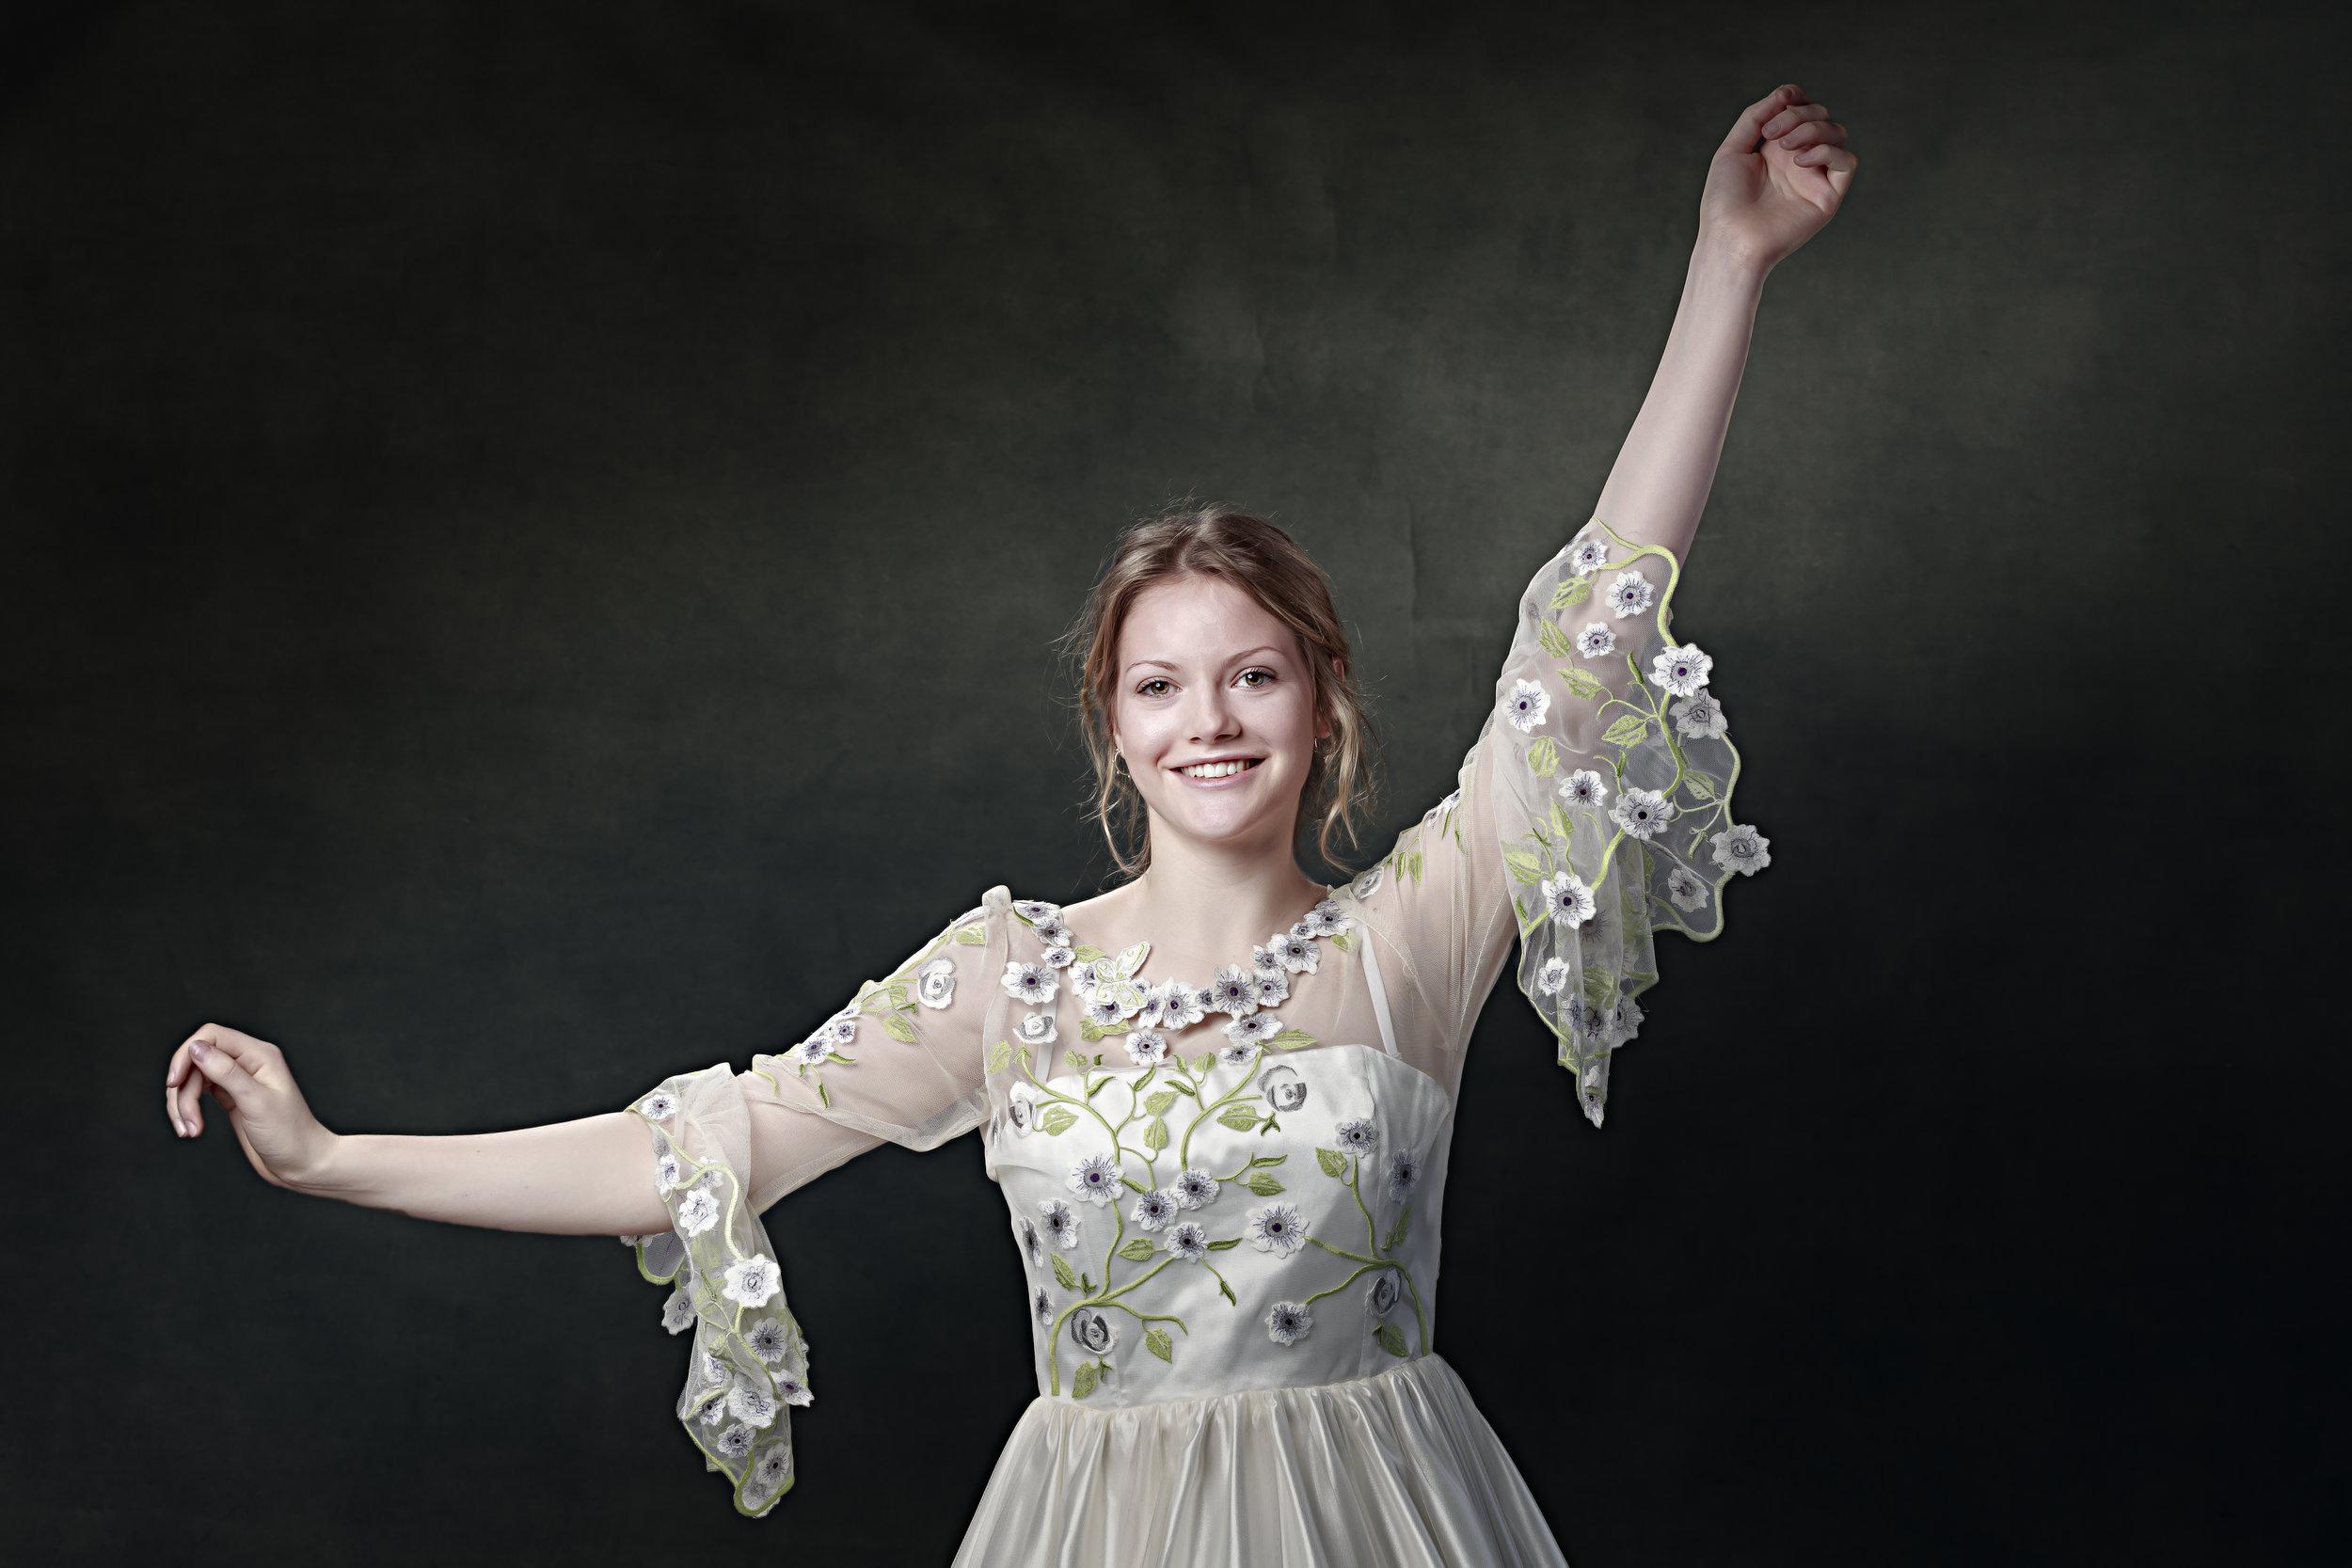 martin dobson wedding dress - 0176 - March 07, 2018 - copyright Foyers Photography-Edit.jpg